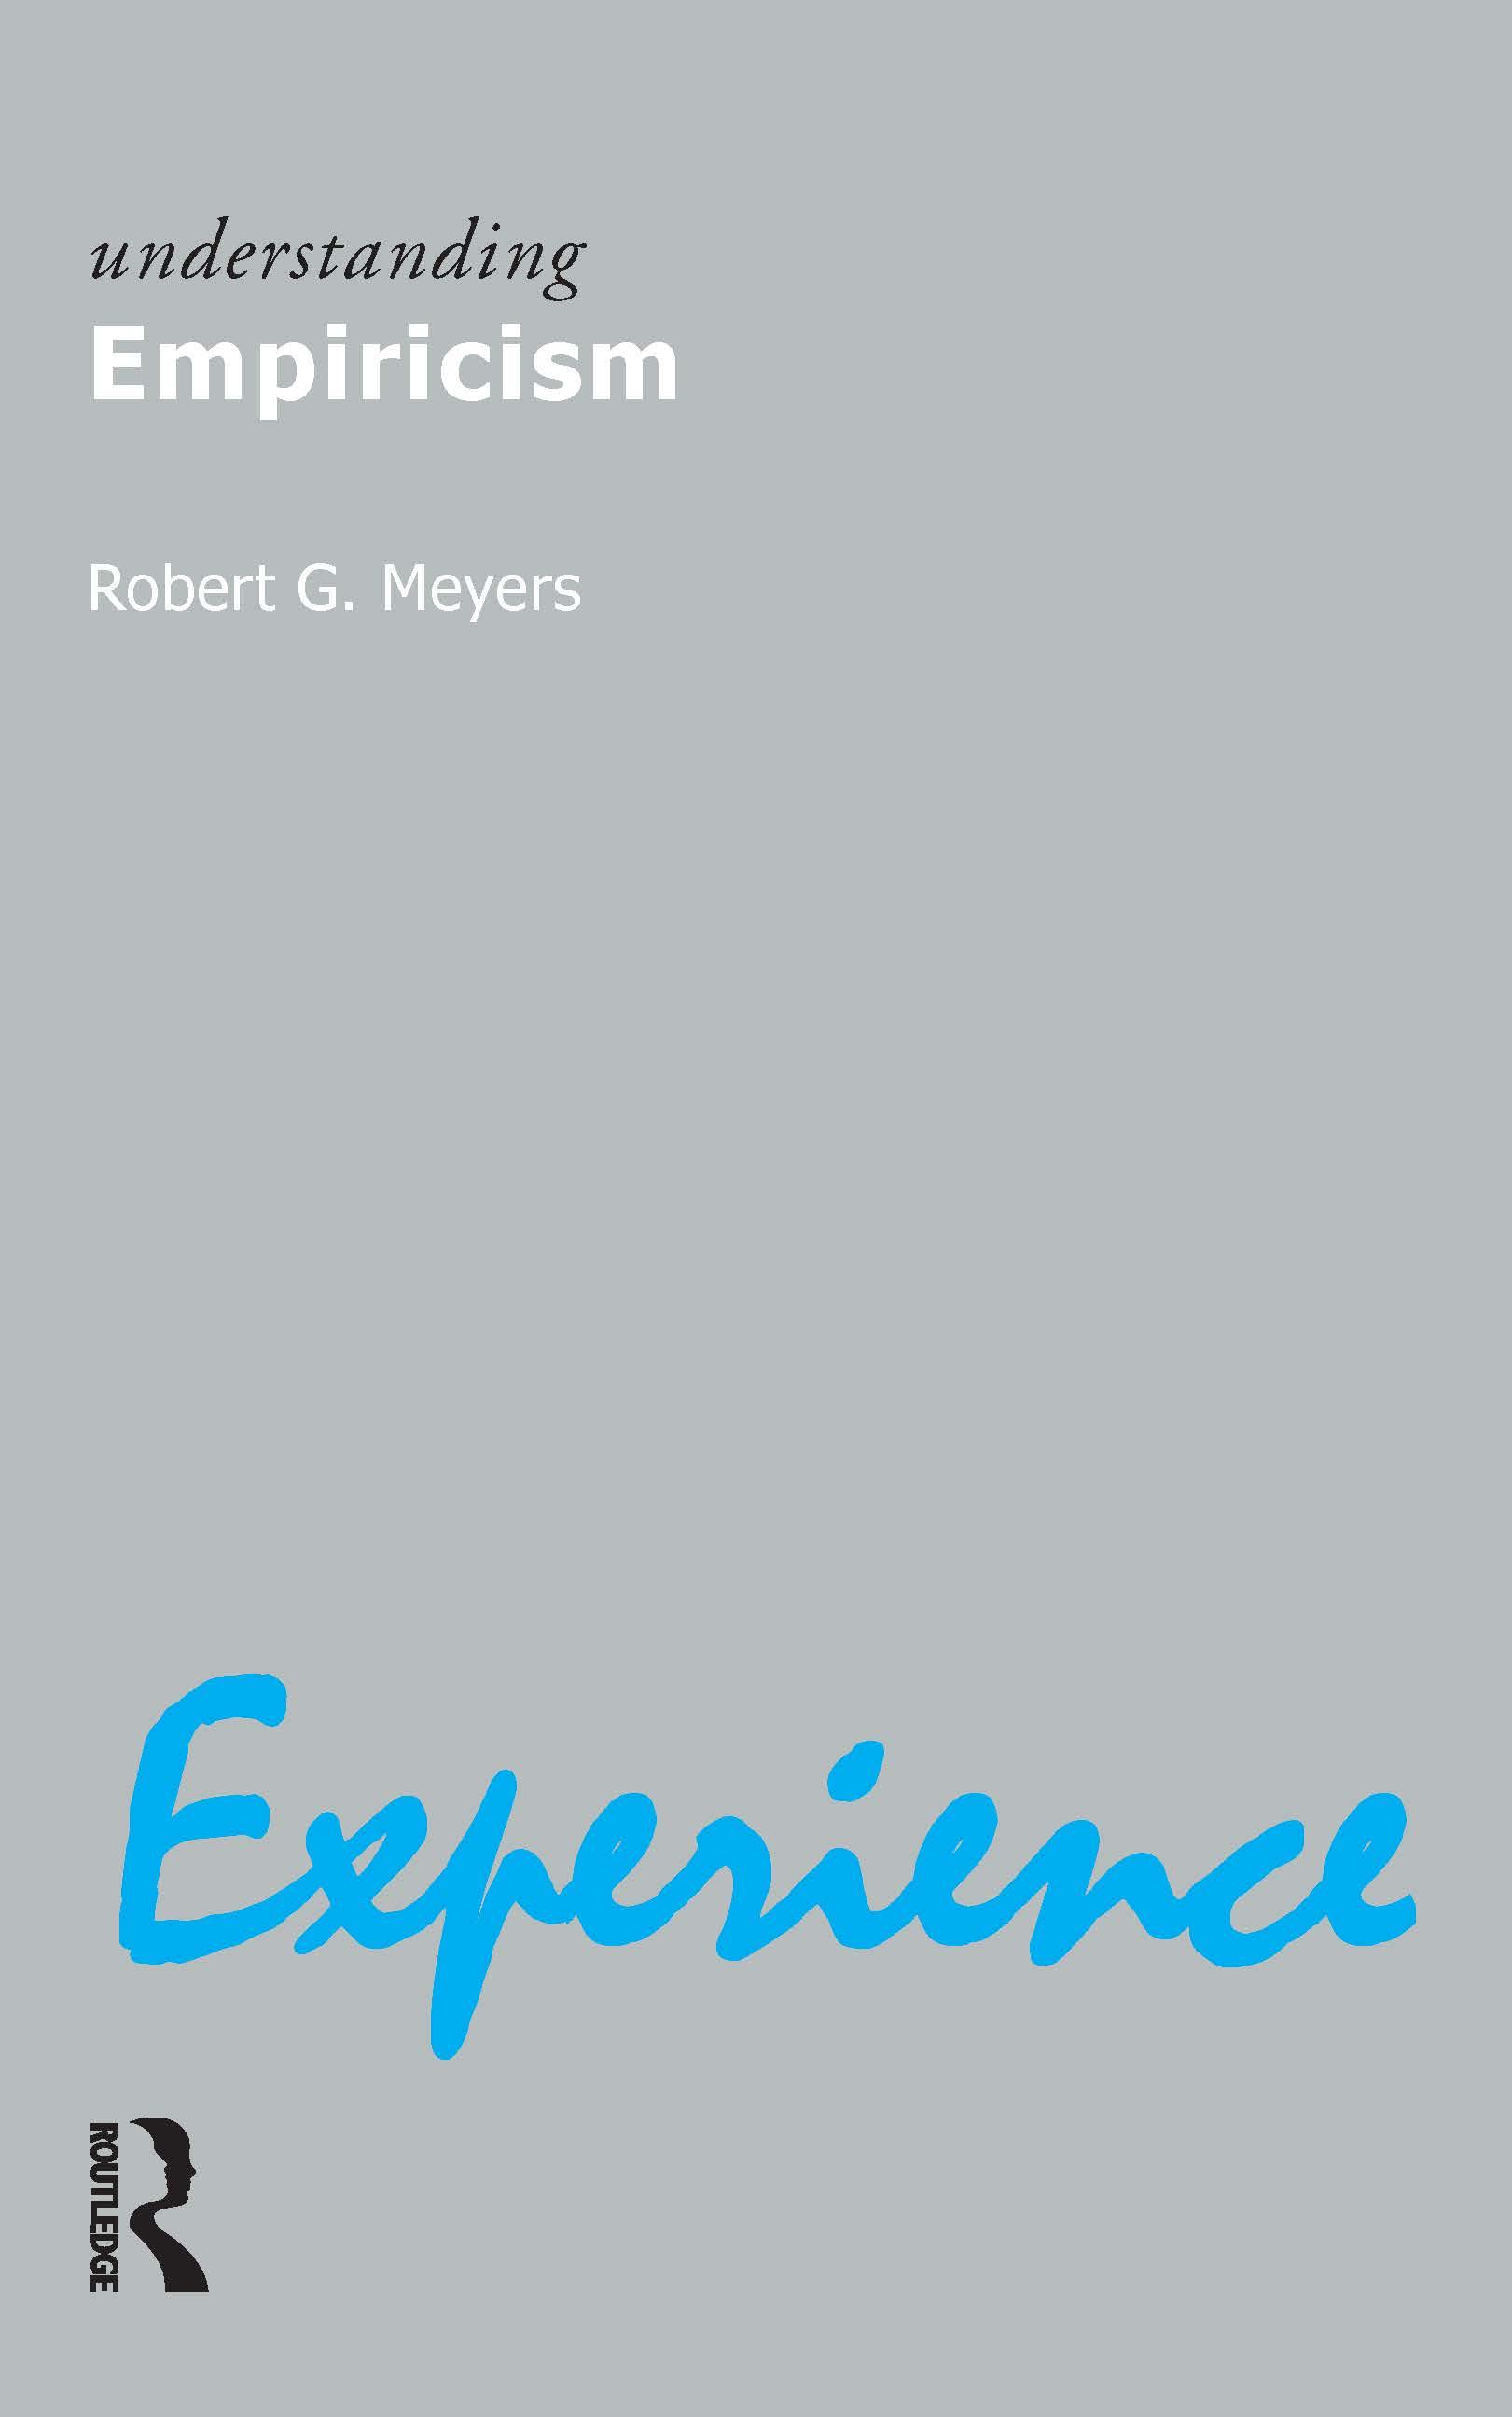 Understanding Empiricism